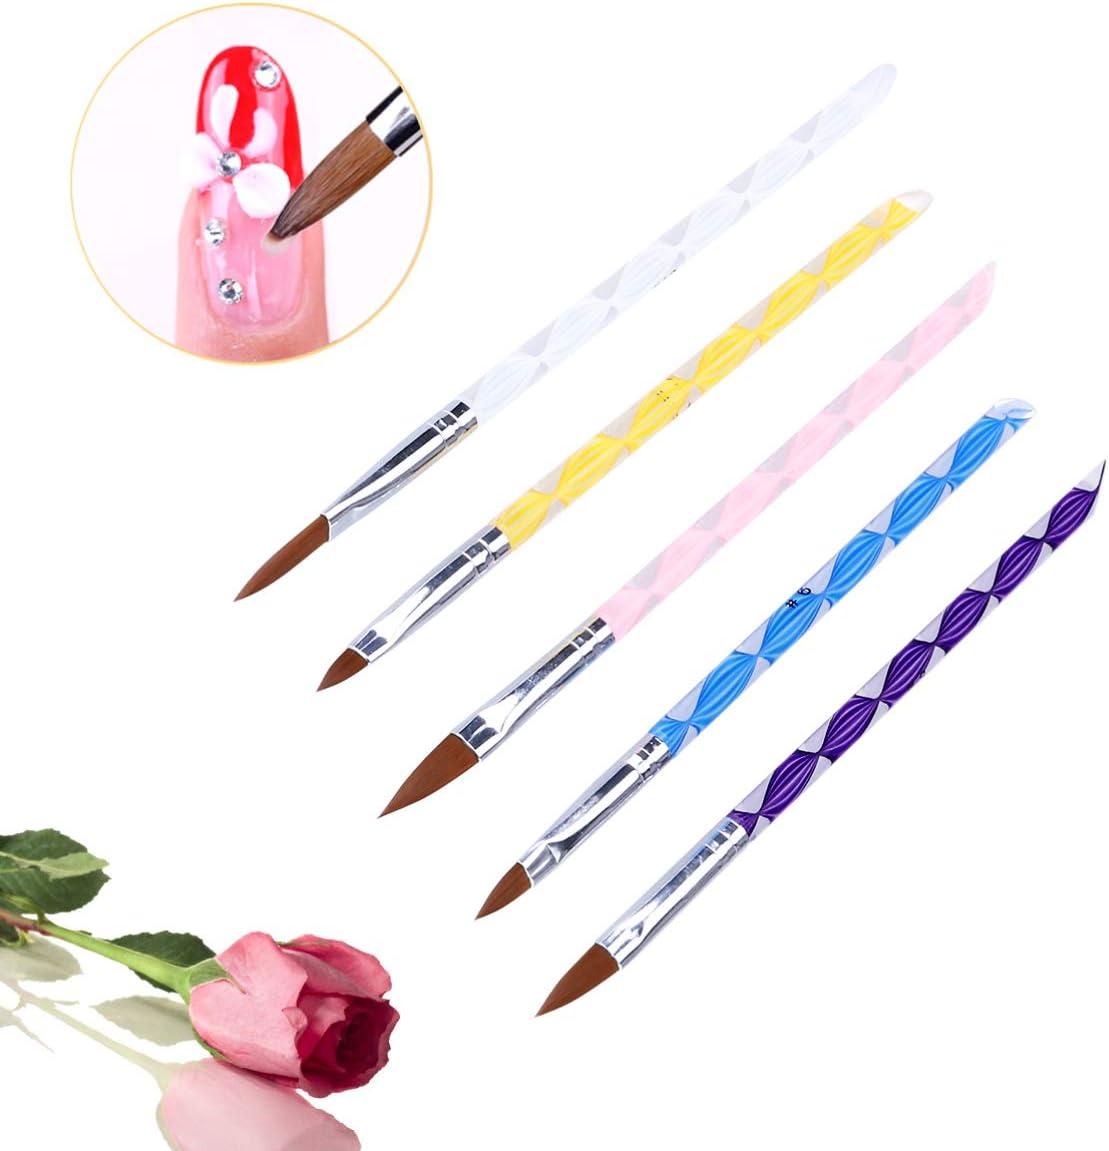 Acrylic Nail Art Pen Brush Nail Polish Tool Foldable Nail Decorating Tool Gel Carving Pen DIY, 5pcs